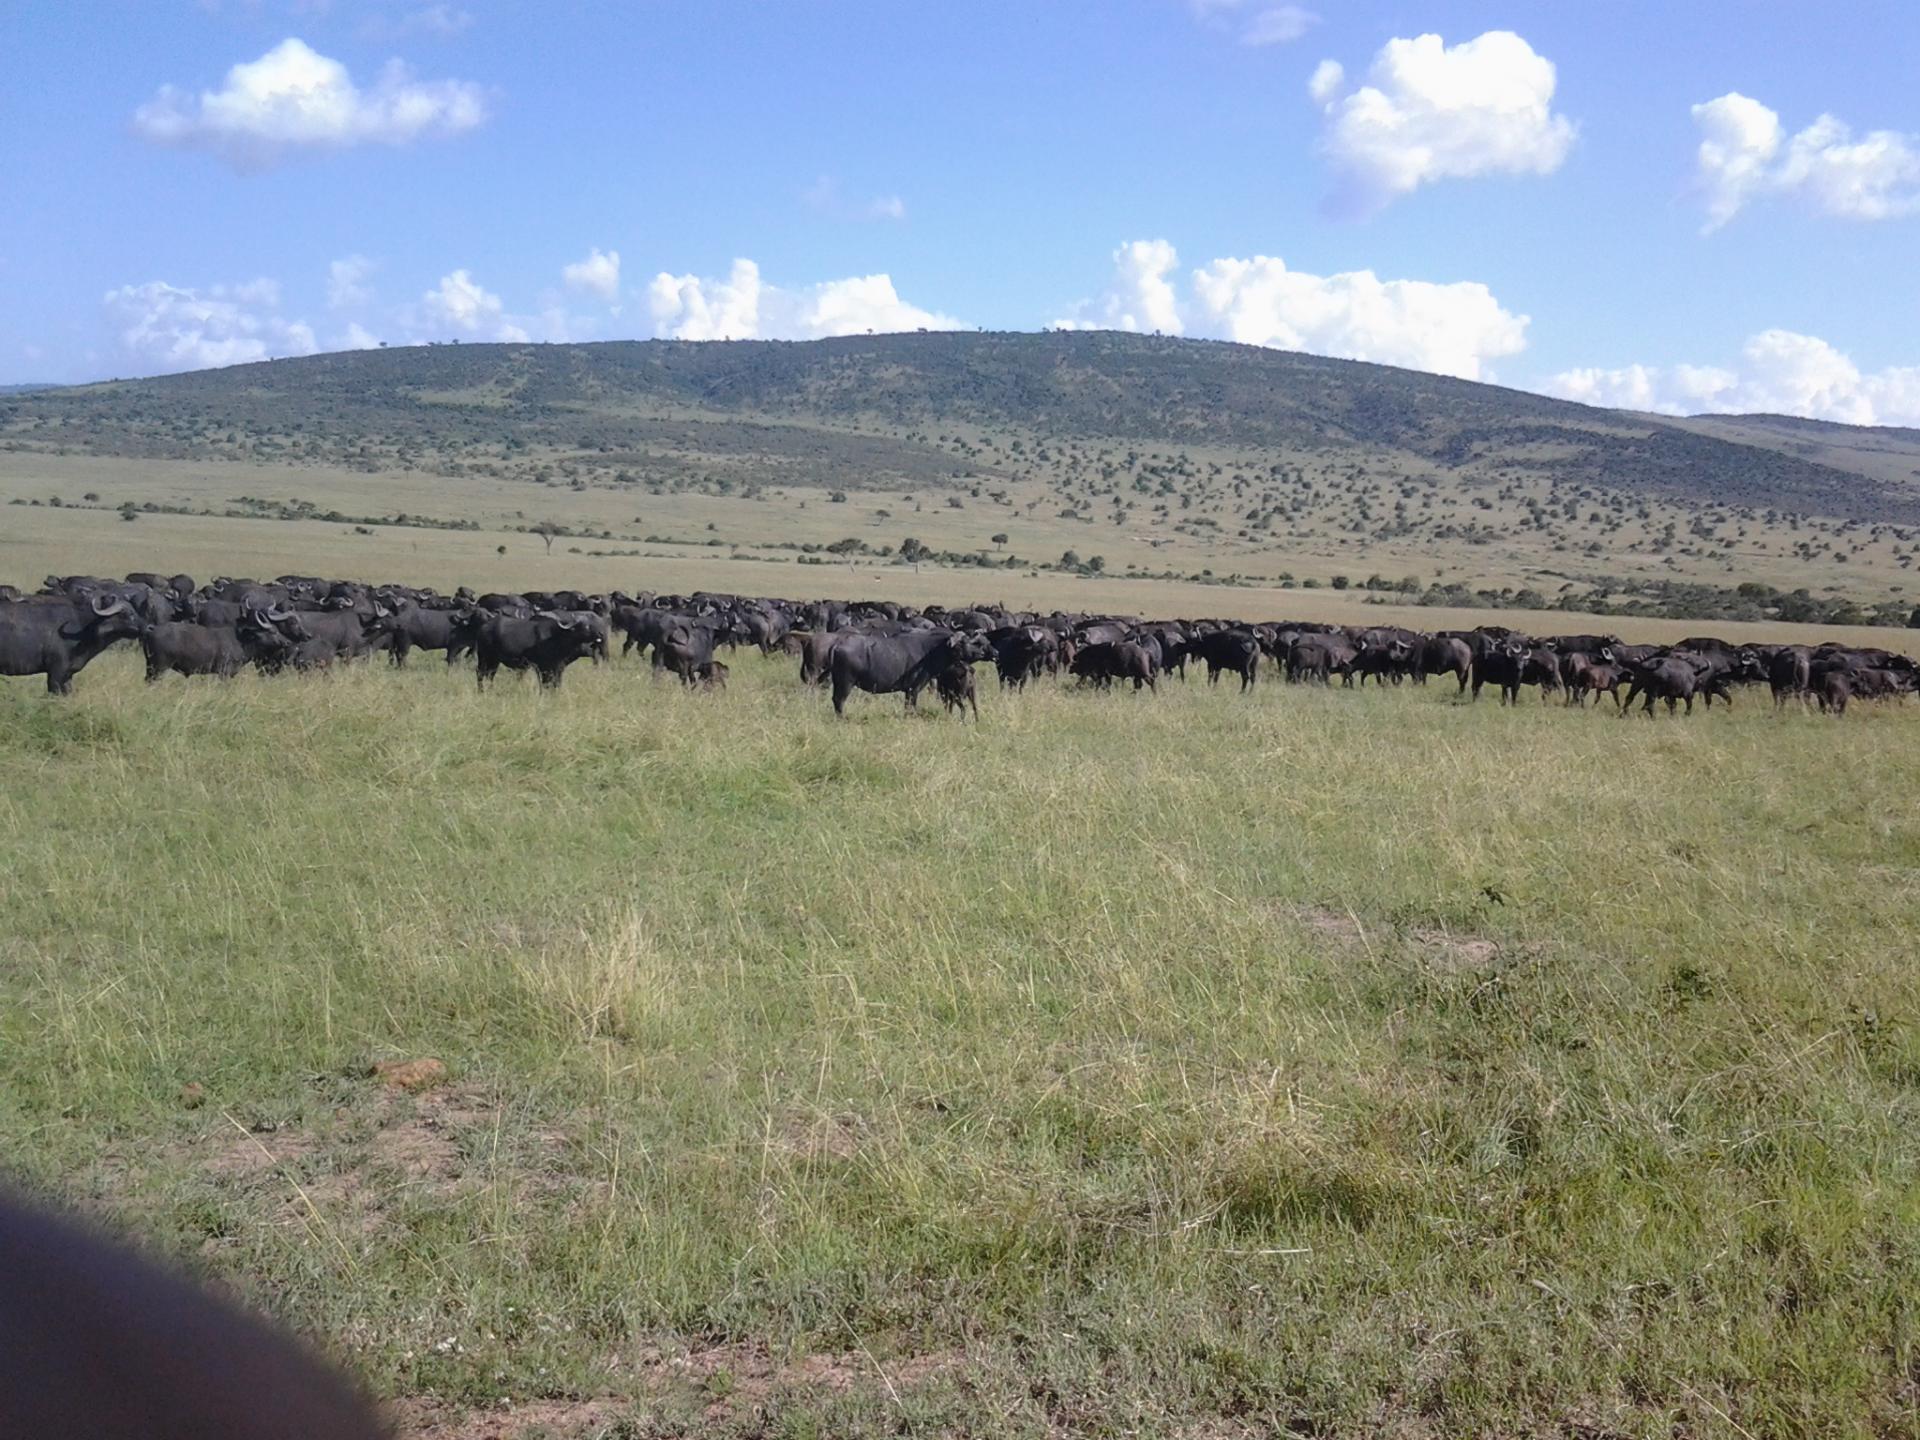 Masai Mara wildlife Safaris-Masai Mara Kenya